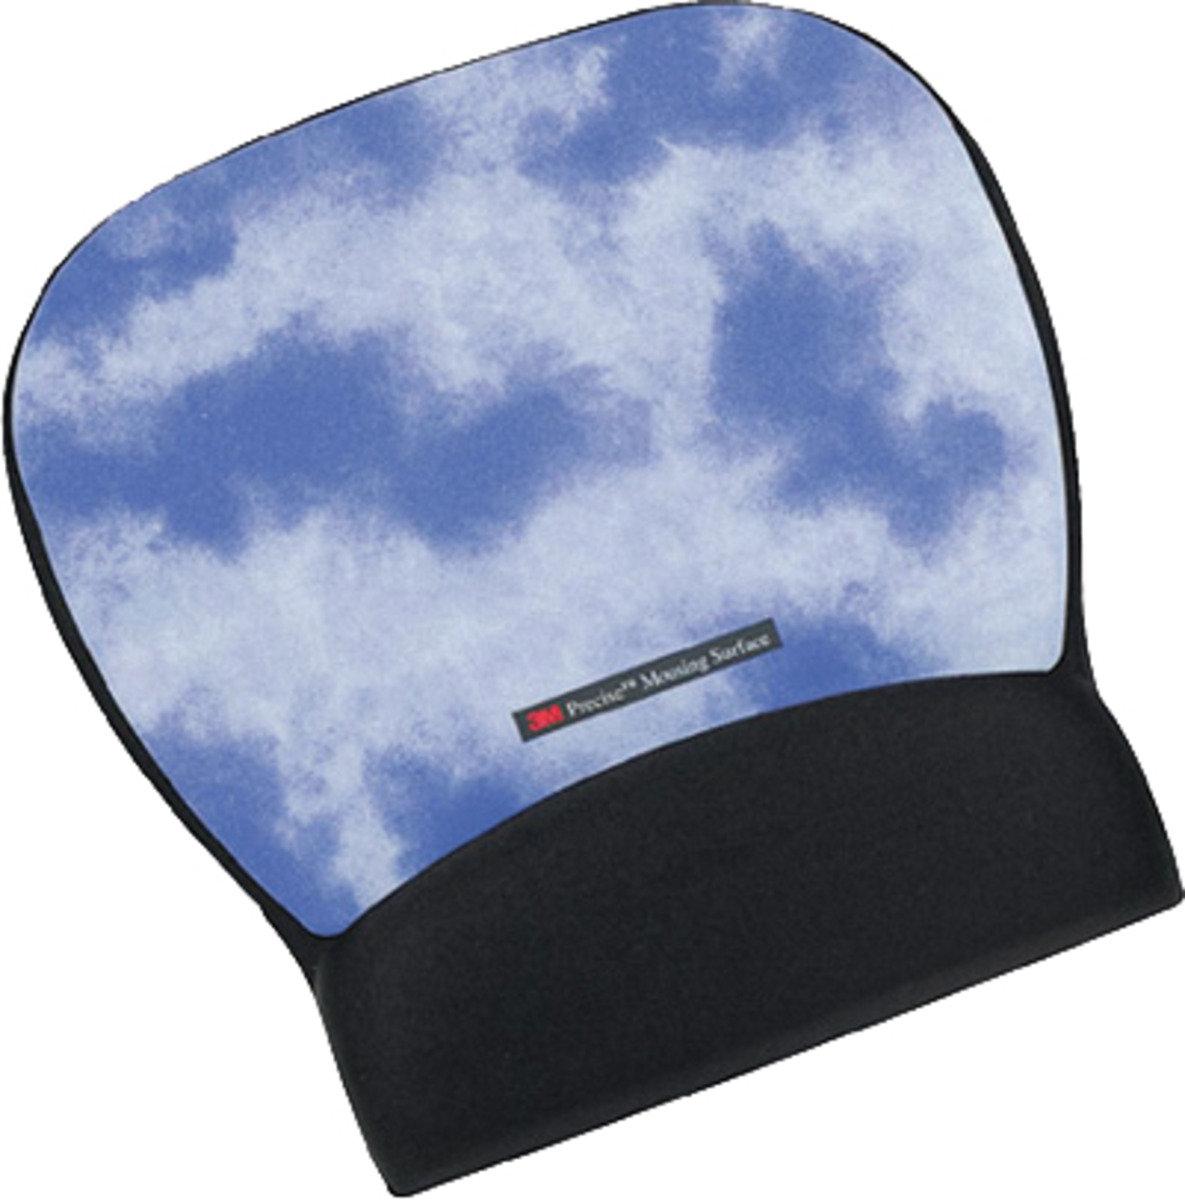 3M™ 穿梭光學滑鼠墊及凝膠腕墊雲彩(MW311CL)